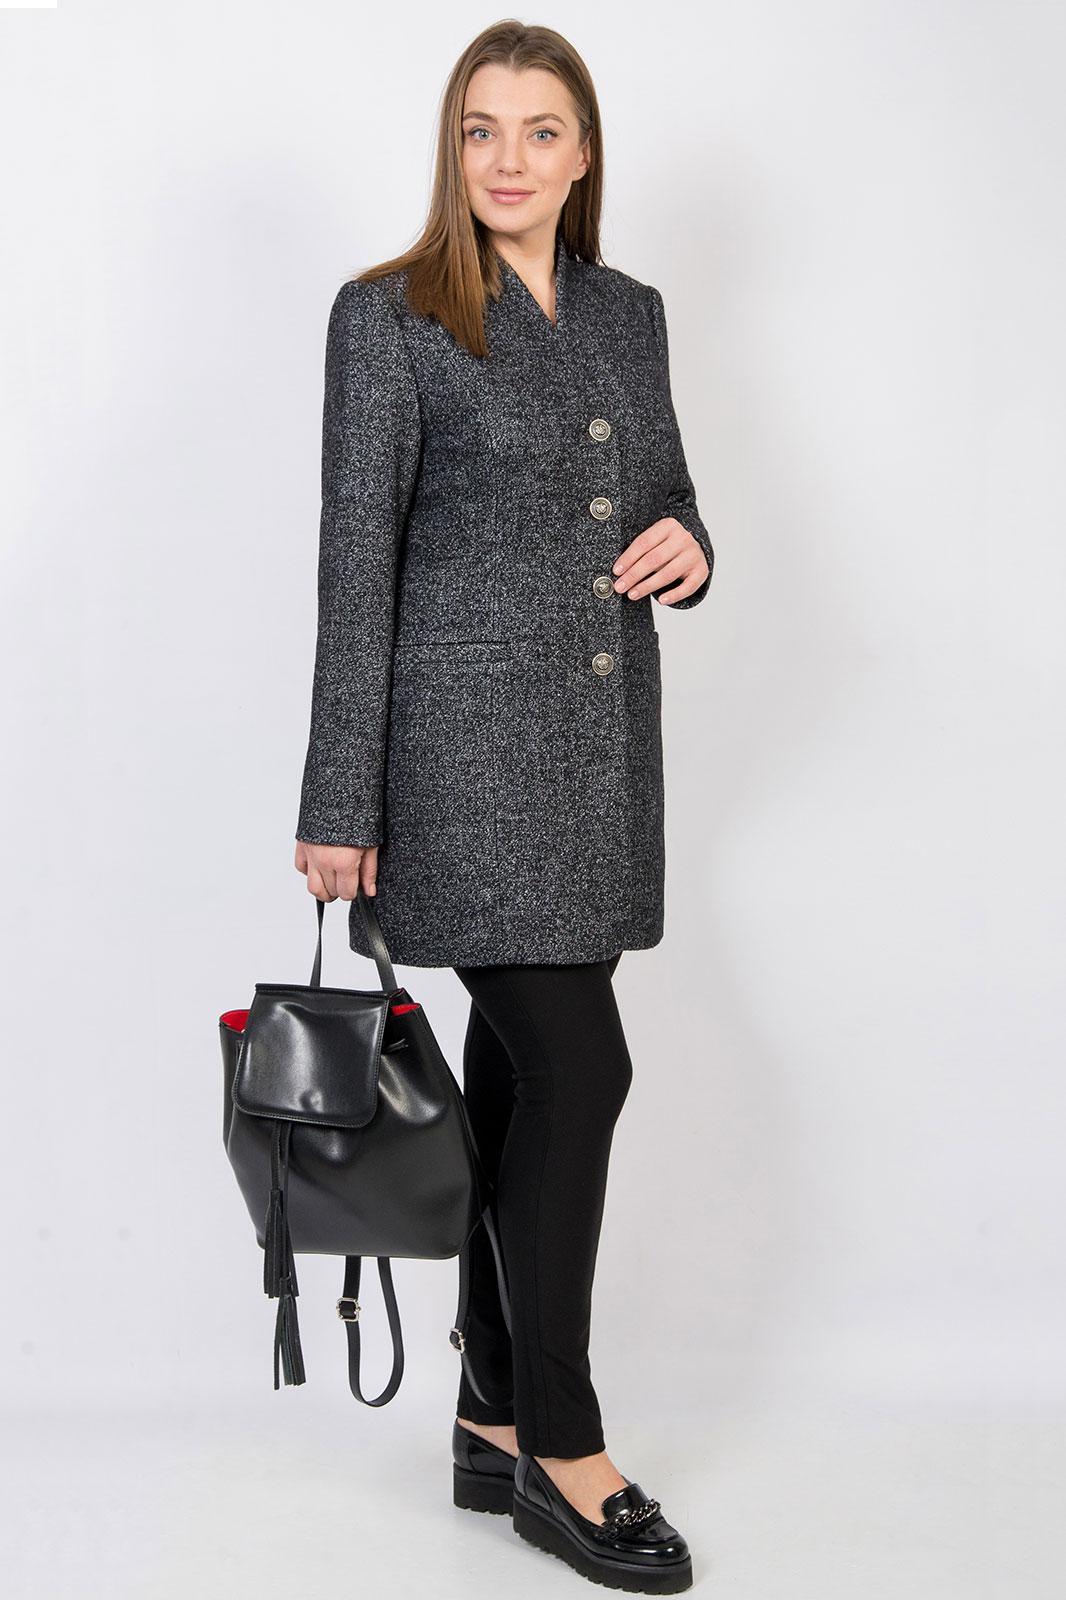 Купить Пальто Tricotex Style, 1552 темно-серый, Беларусь